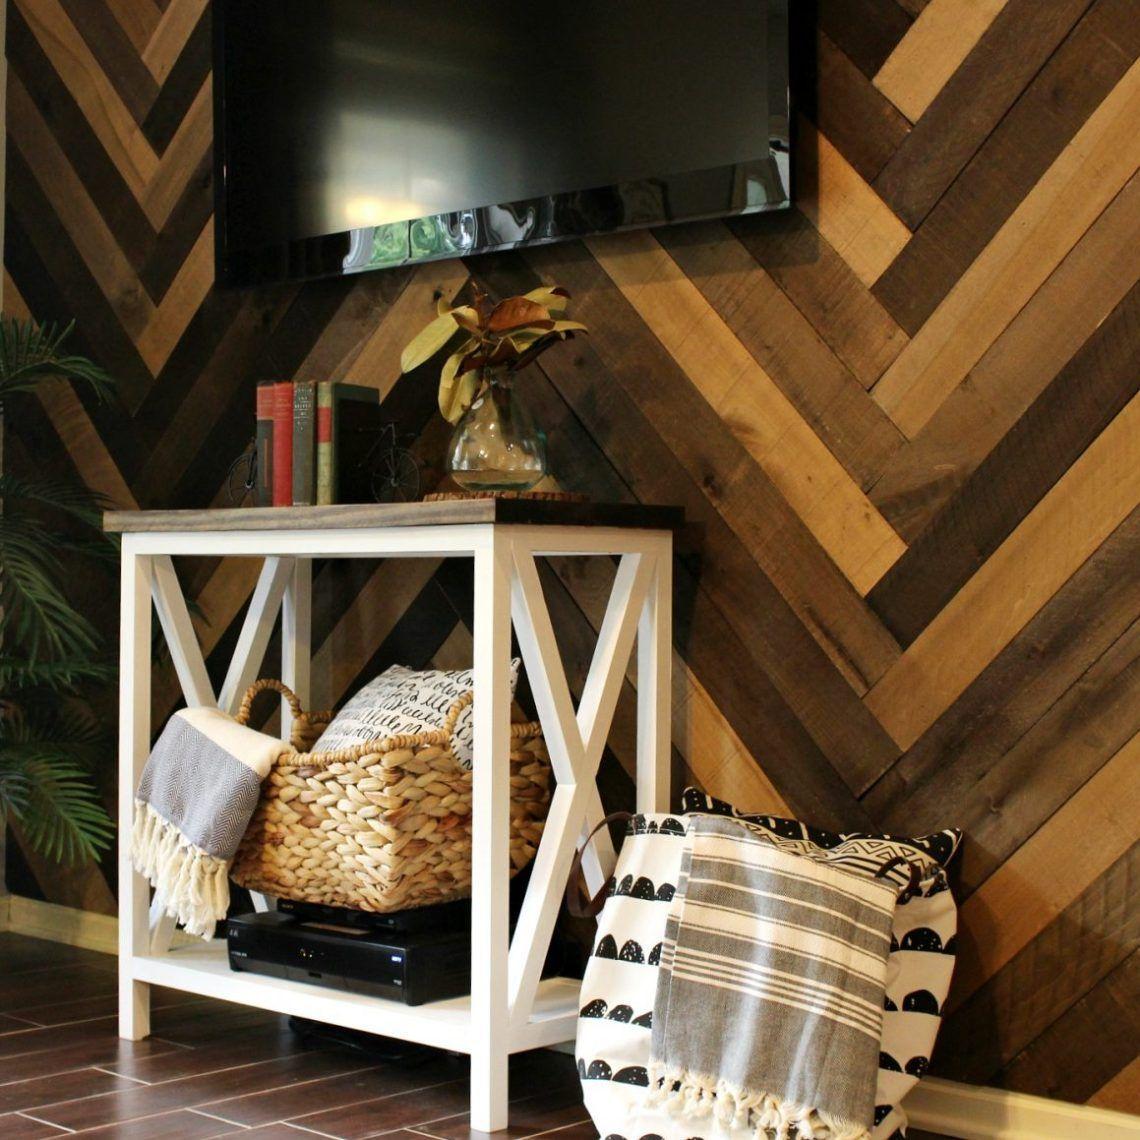 How to Install a DIY Herringbone Barn Wood Wall (With